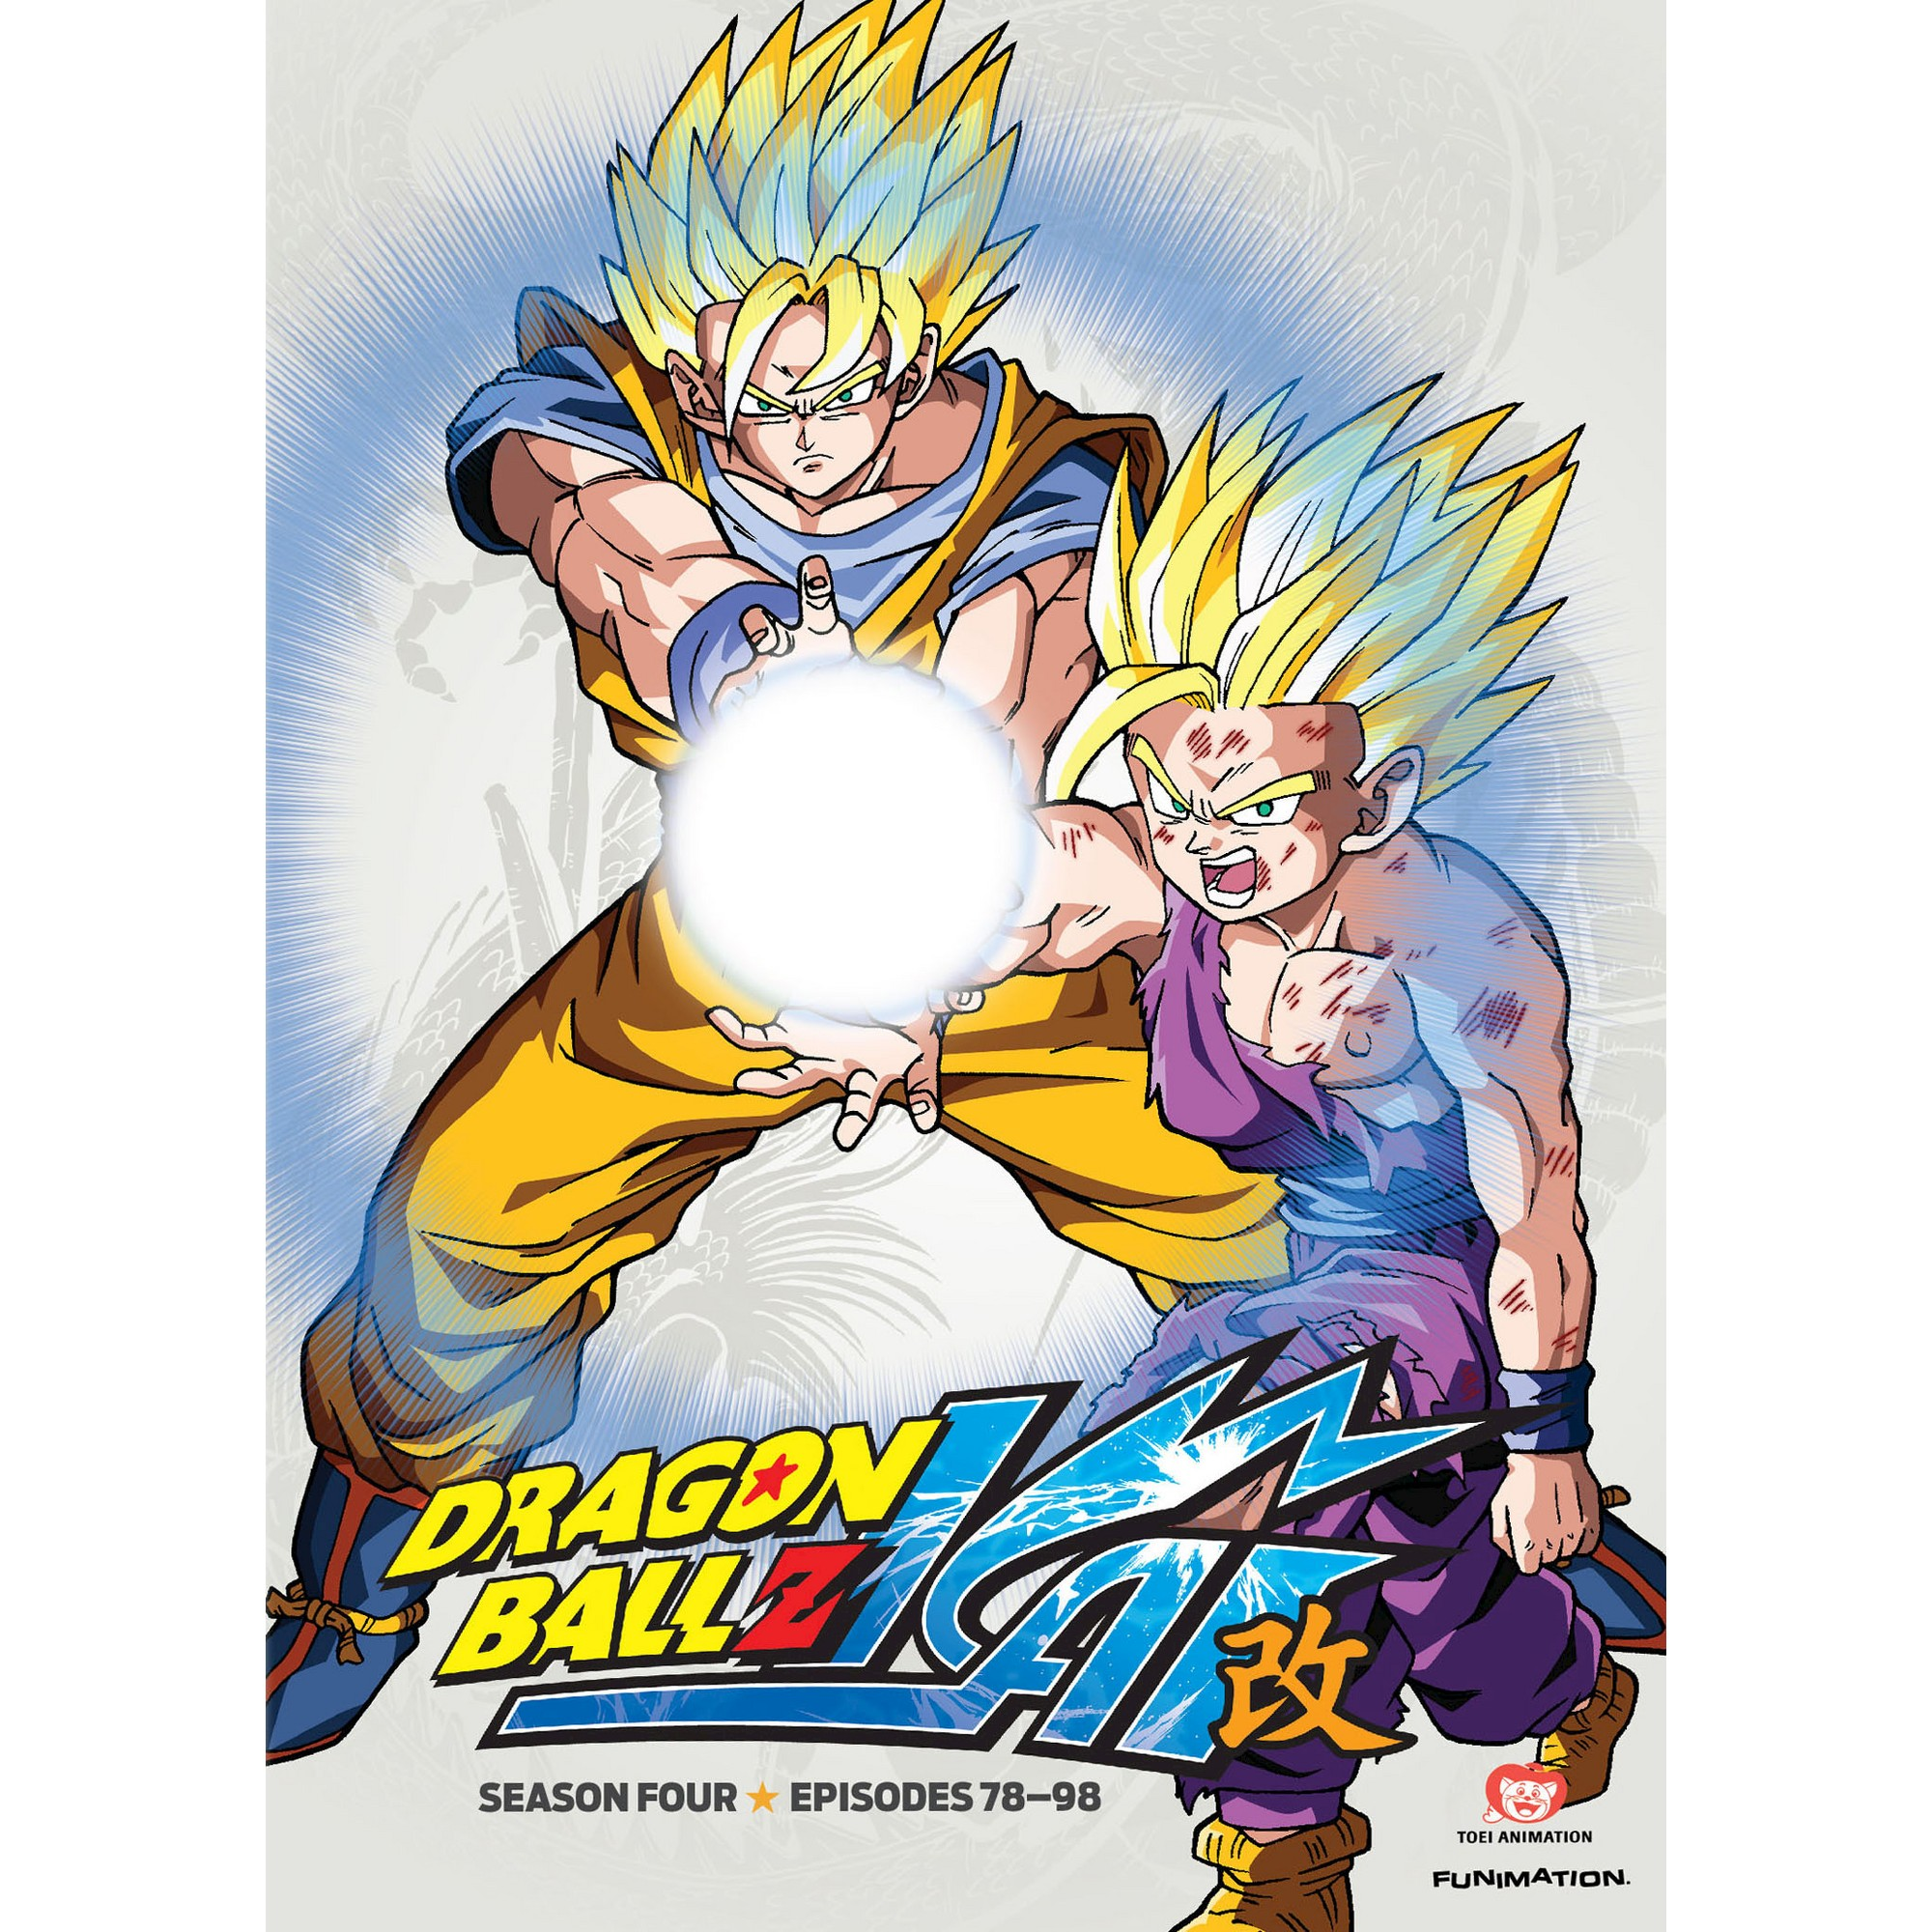 Pin By Animechick101 On Dragon Ball In 2021 Dragon Ball Z Dragon Ball Anime Dragon Ball